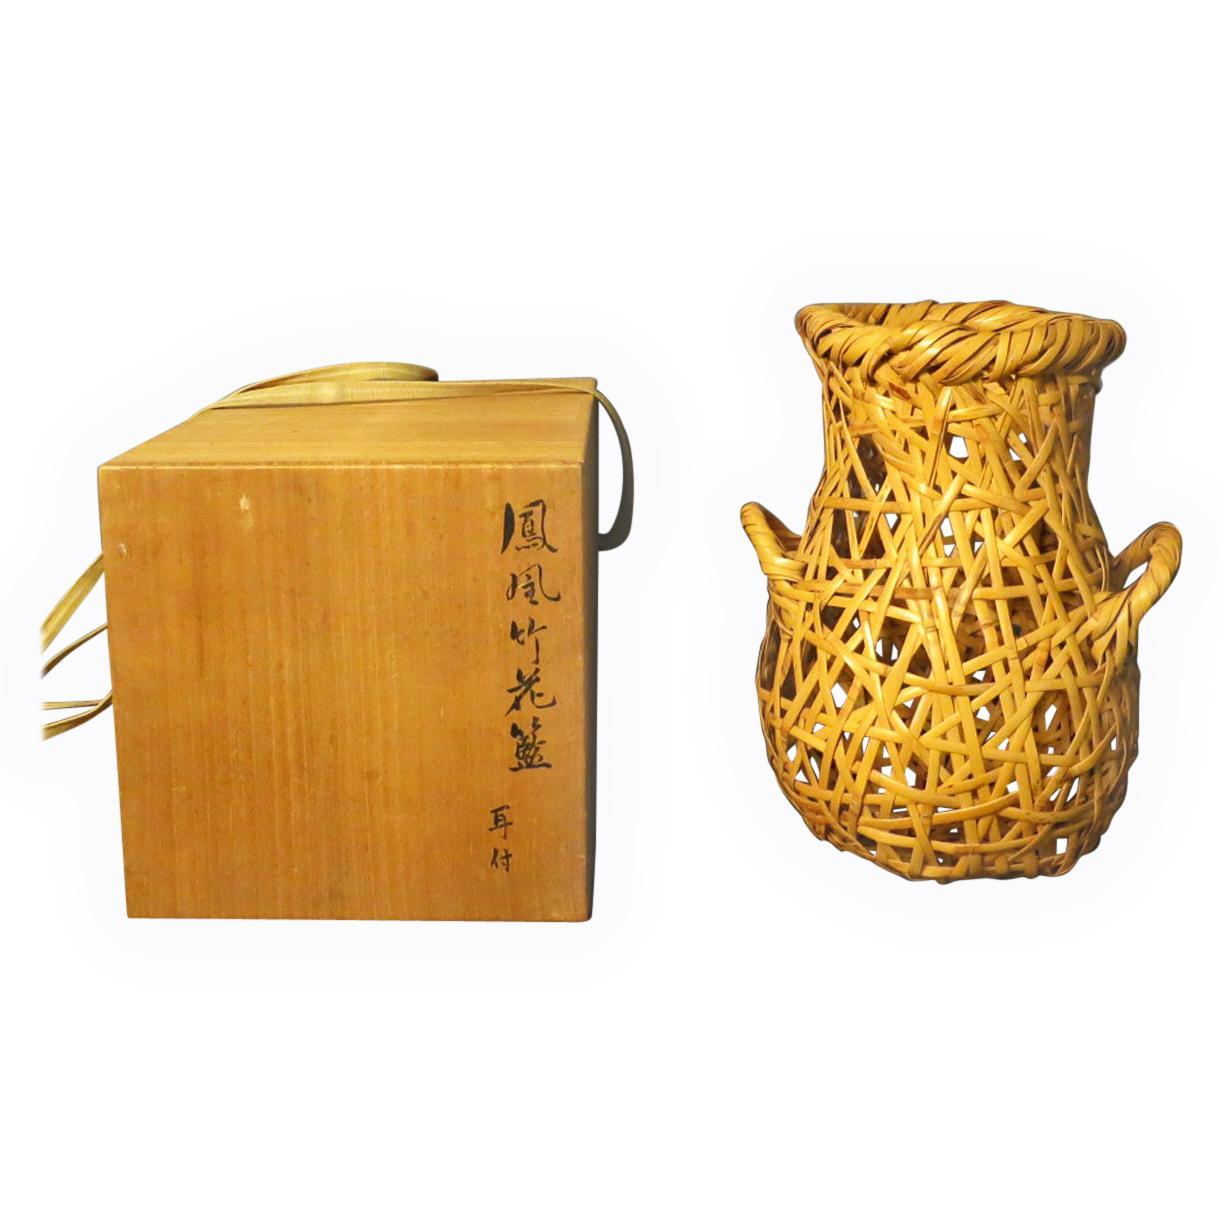 Japanese Bamboo Basket Ikebana by Hayakawa Shokosai IV